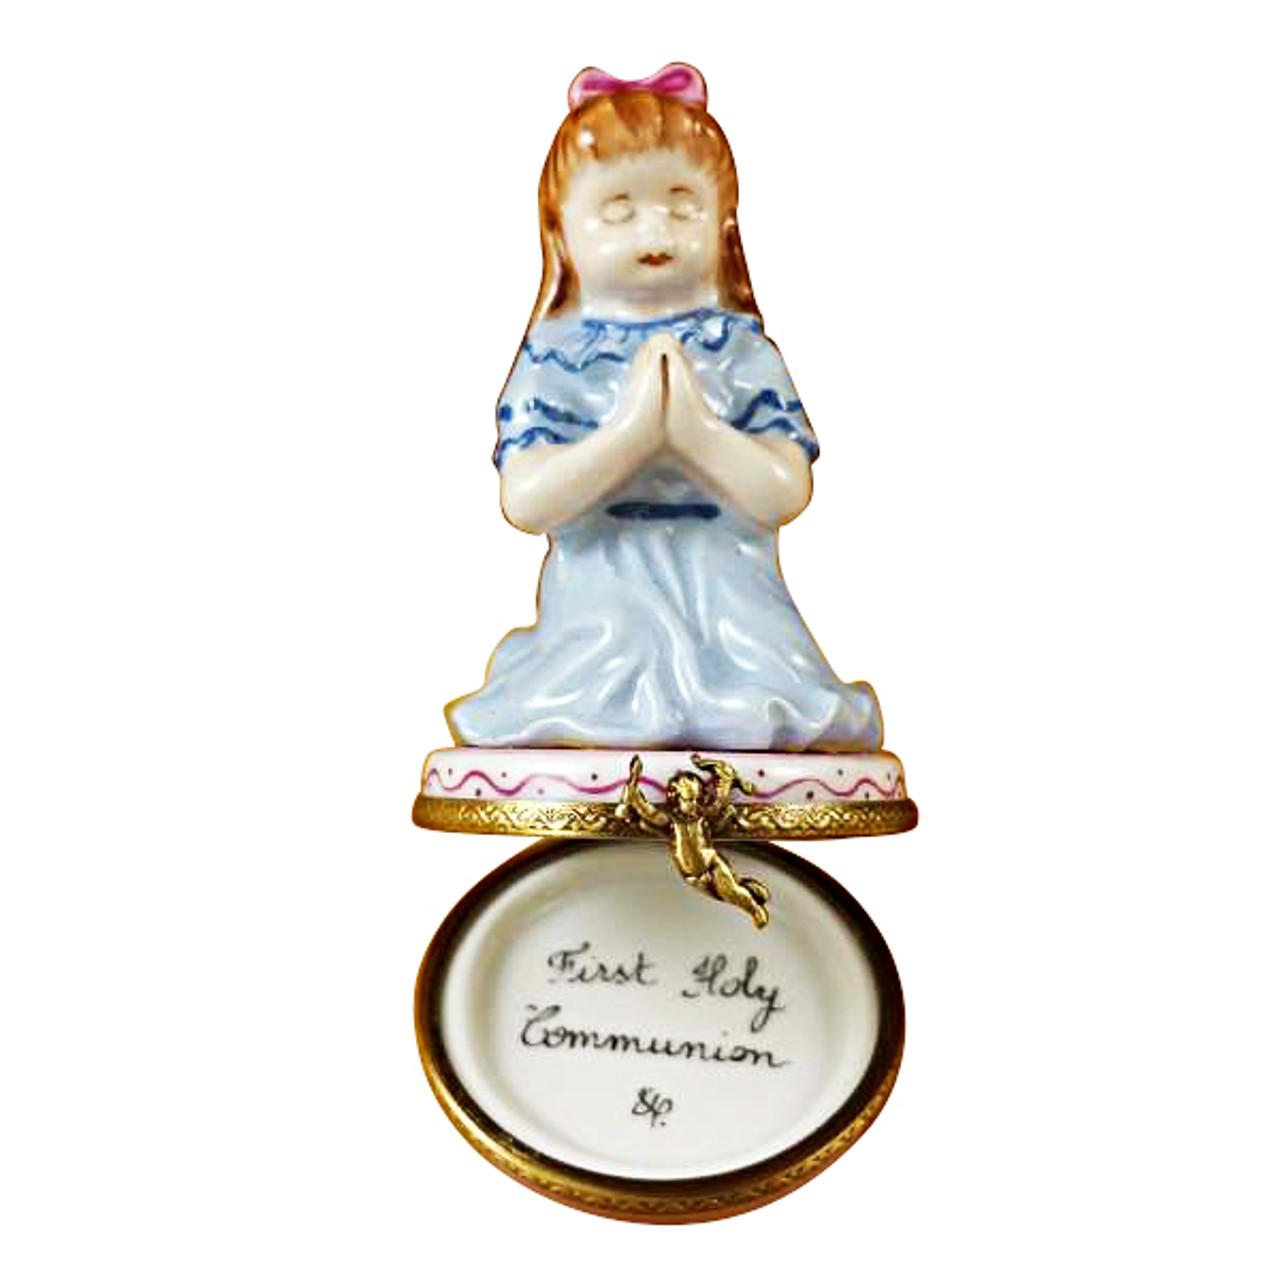 Limoges Imports Brunette Girl Praying Limoges Box